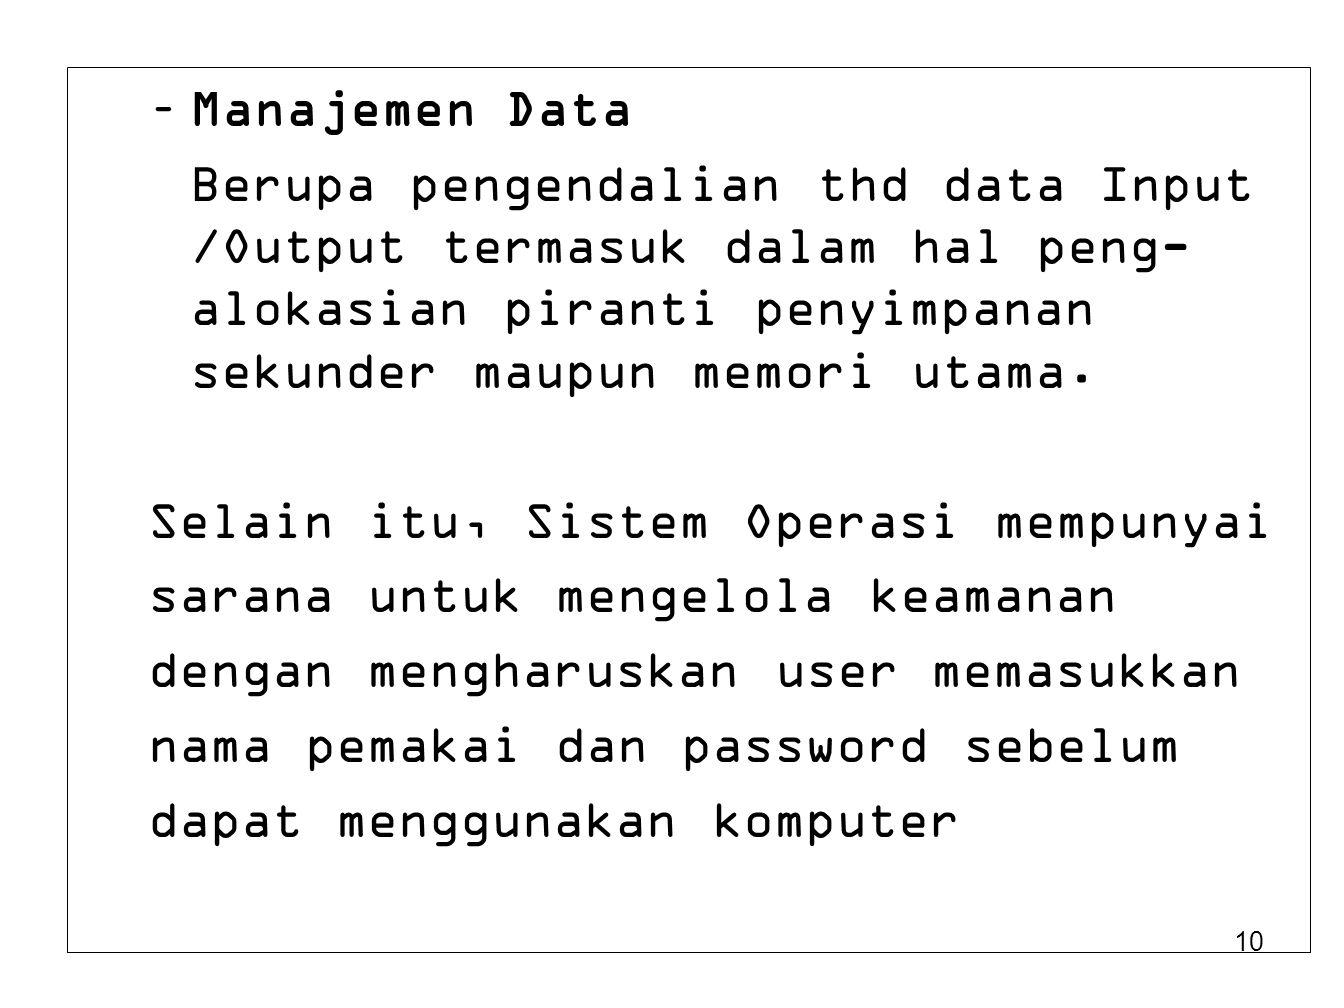 Manajemen Data Berupa pengendalian thd data Input /Output termasuk dalam hal peng-alokasian piranti penyimpanan sekunder maupun memori utama.